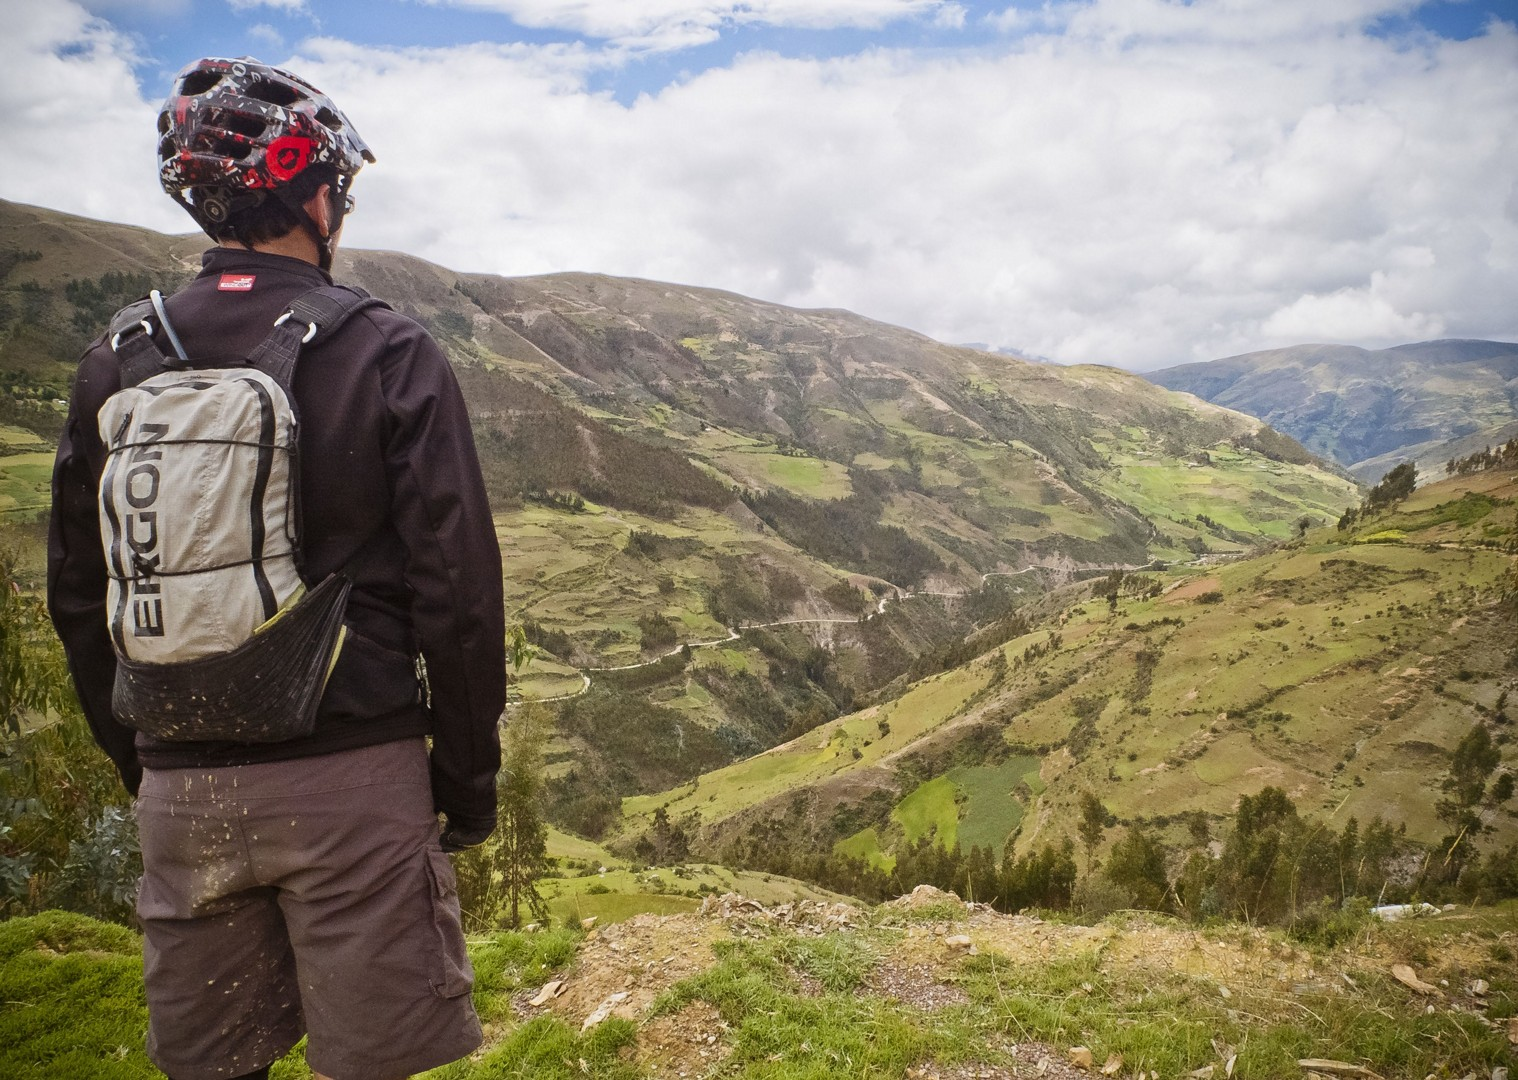 150422_Bike to Manu_12.jpg - Peru - Andes, Amazon and Machu Picchu - Cycling Adventures